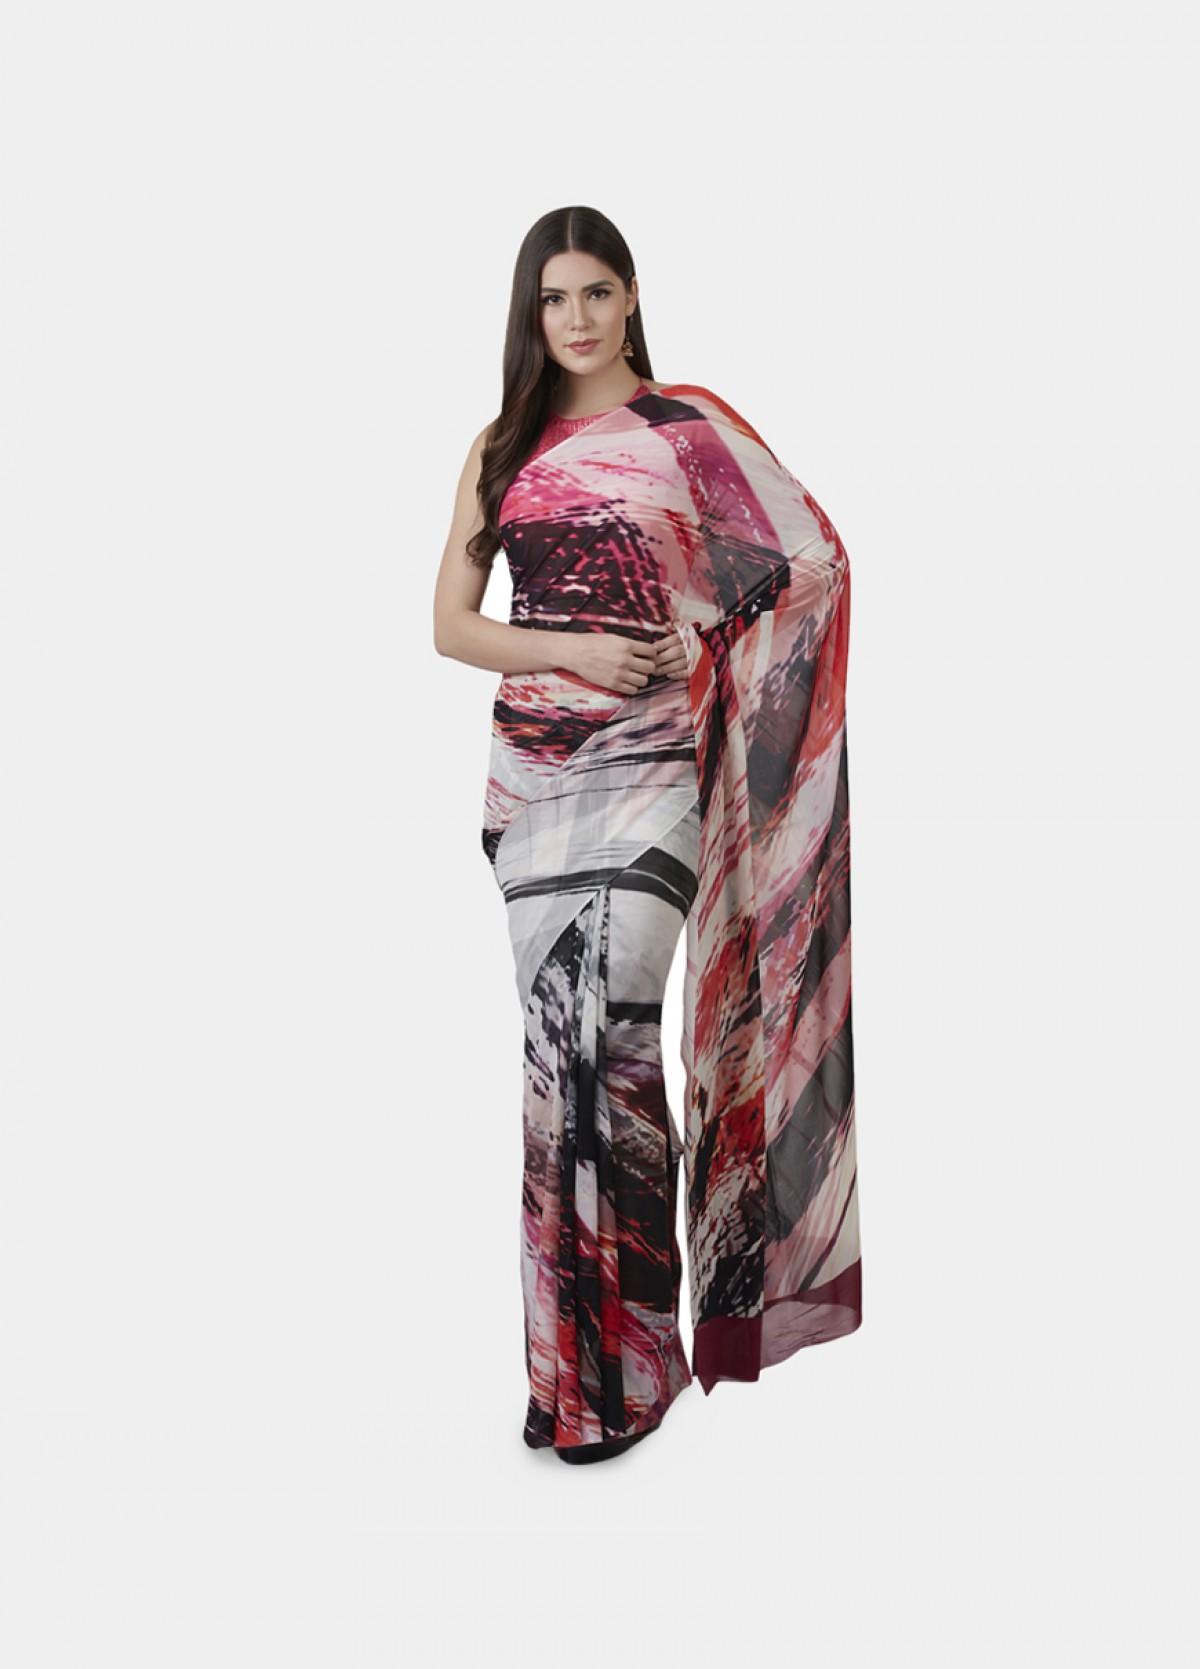 The Zayka Sari